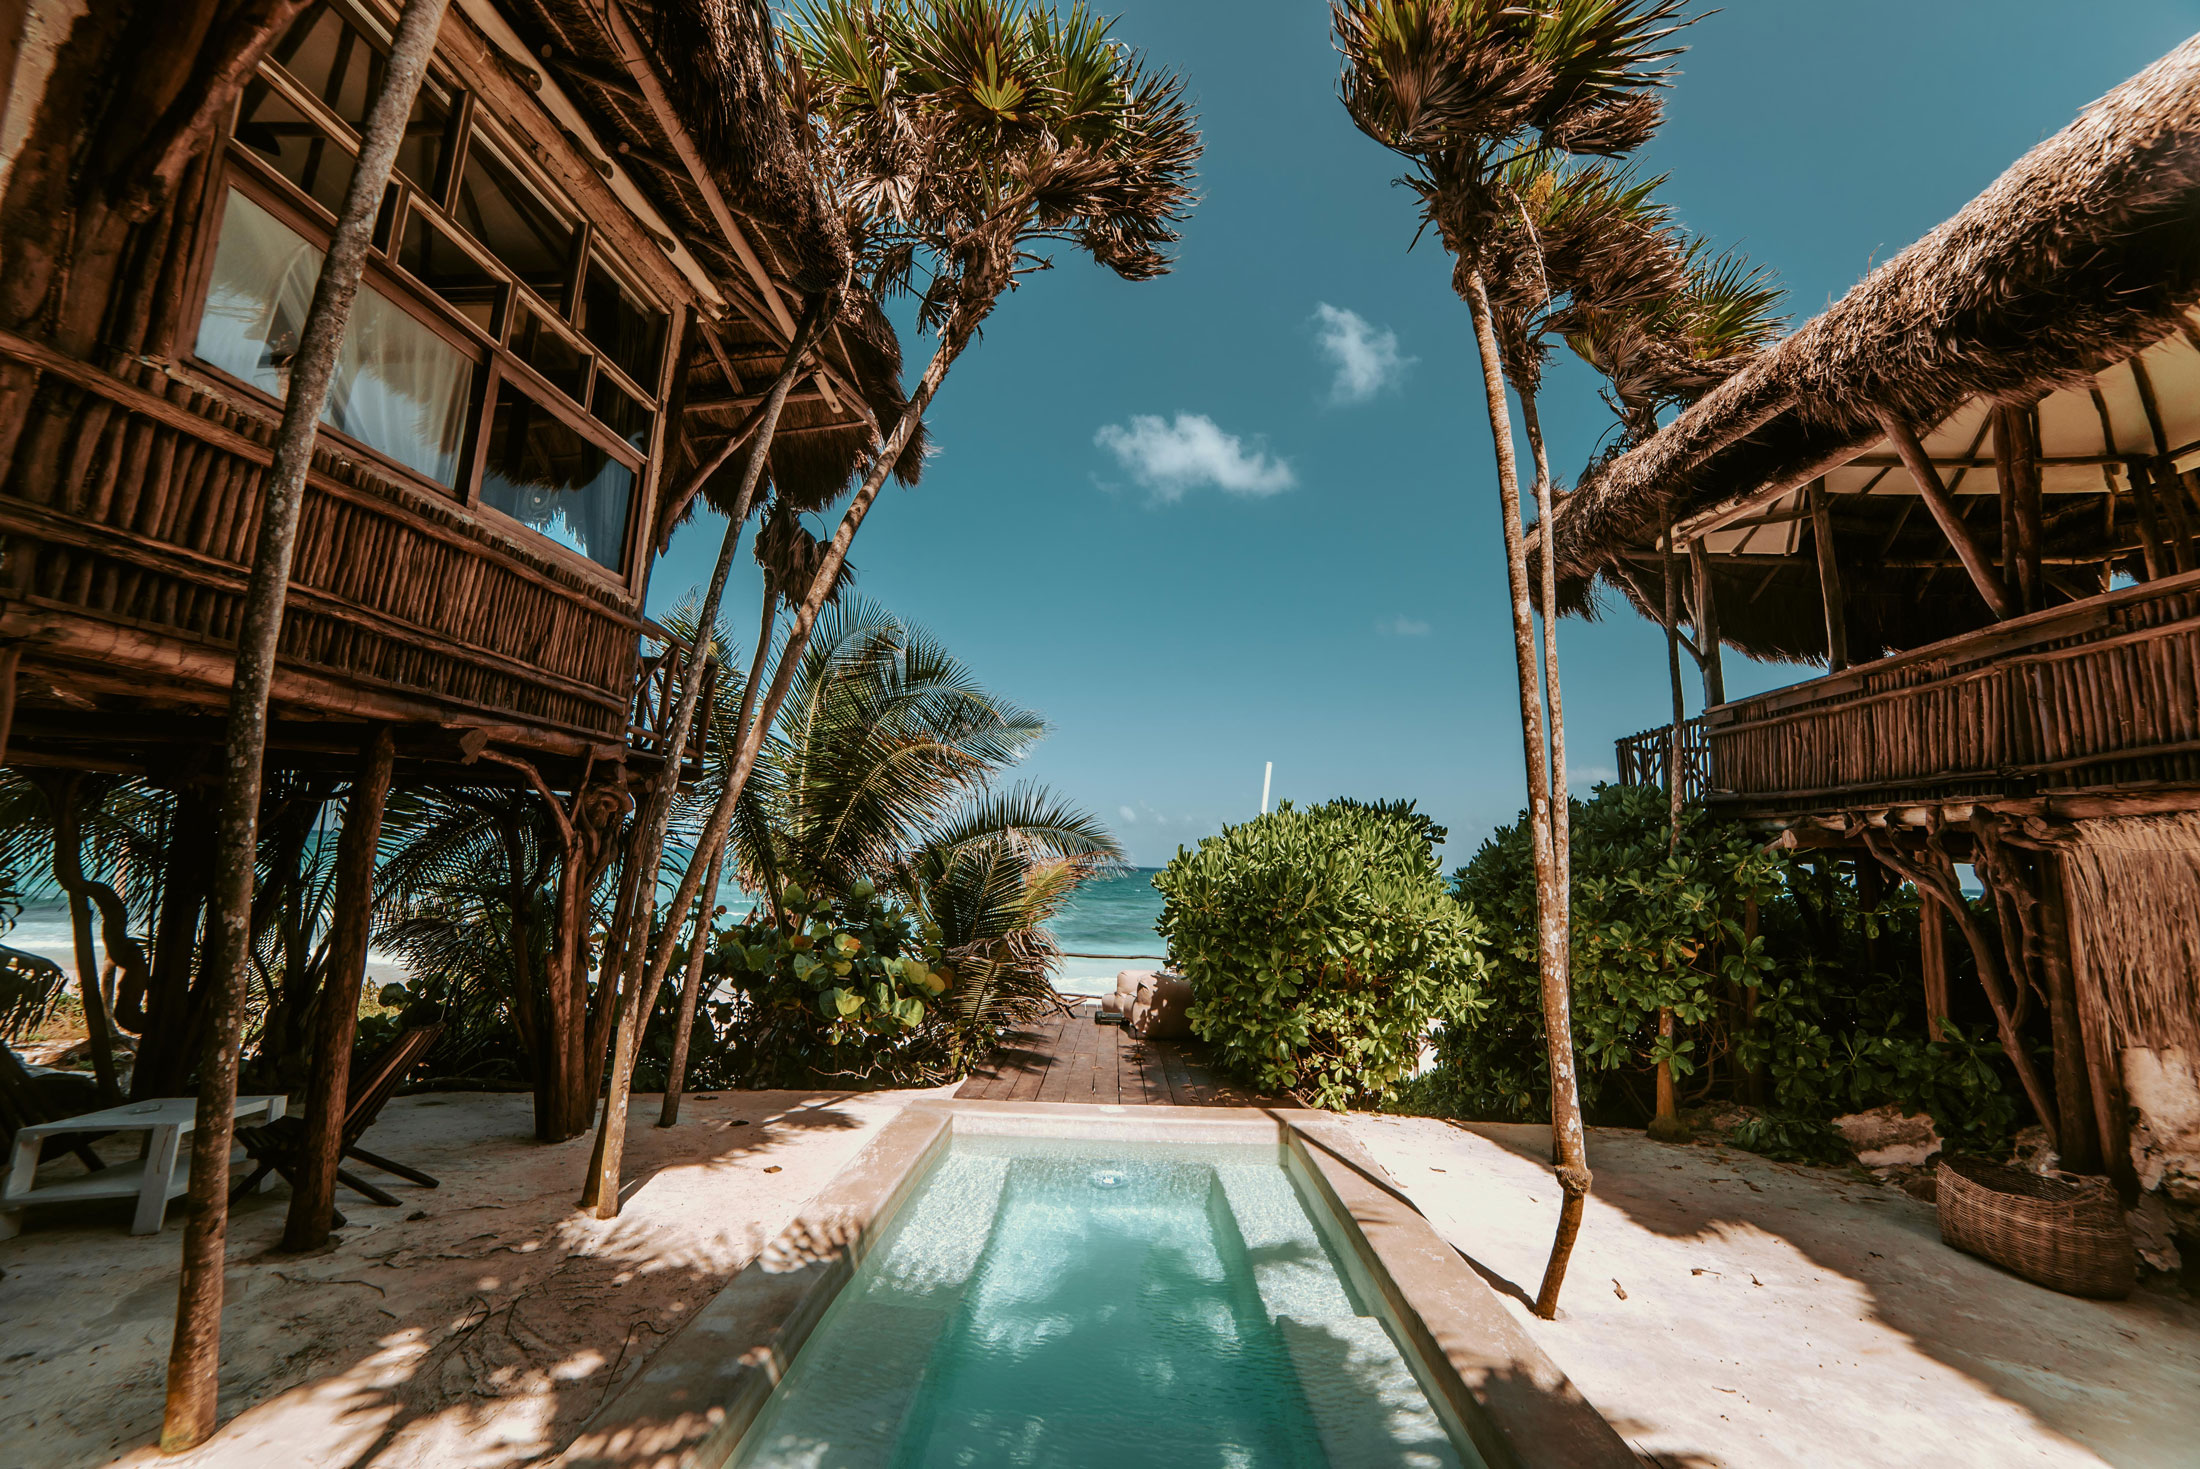 Maya_Luxe_Riviera_Maya_Luxury_Villas_Experiences_Tulum_Hotel_Zone_2_Bedrooms_Casa_Madera_1 (1).jpg